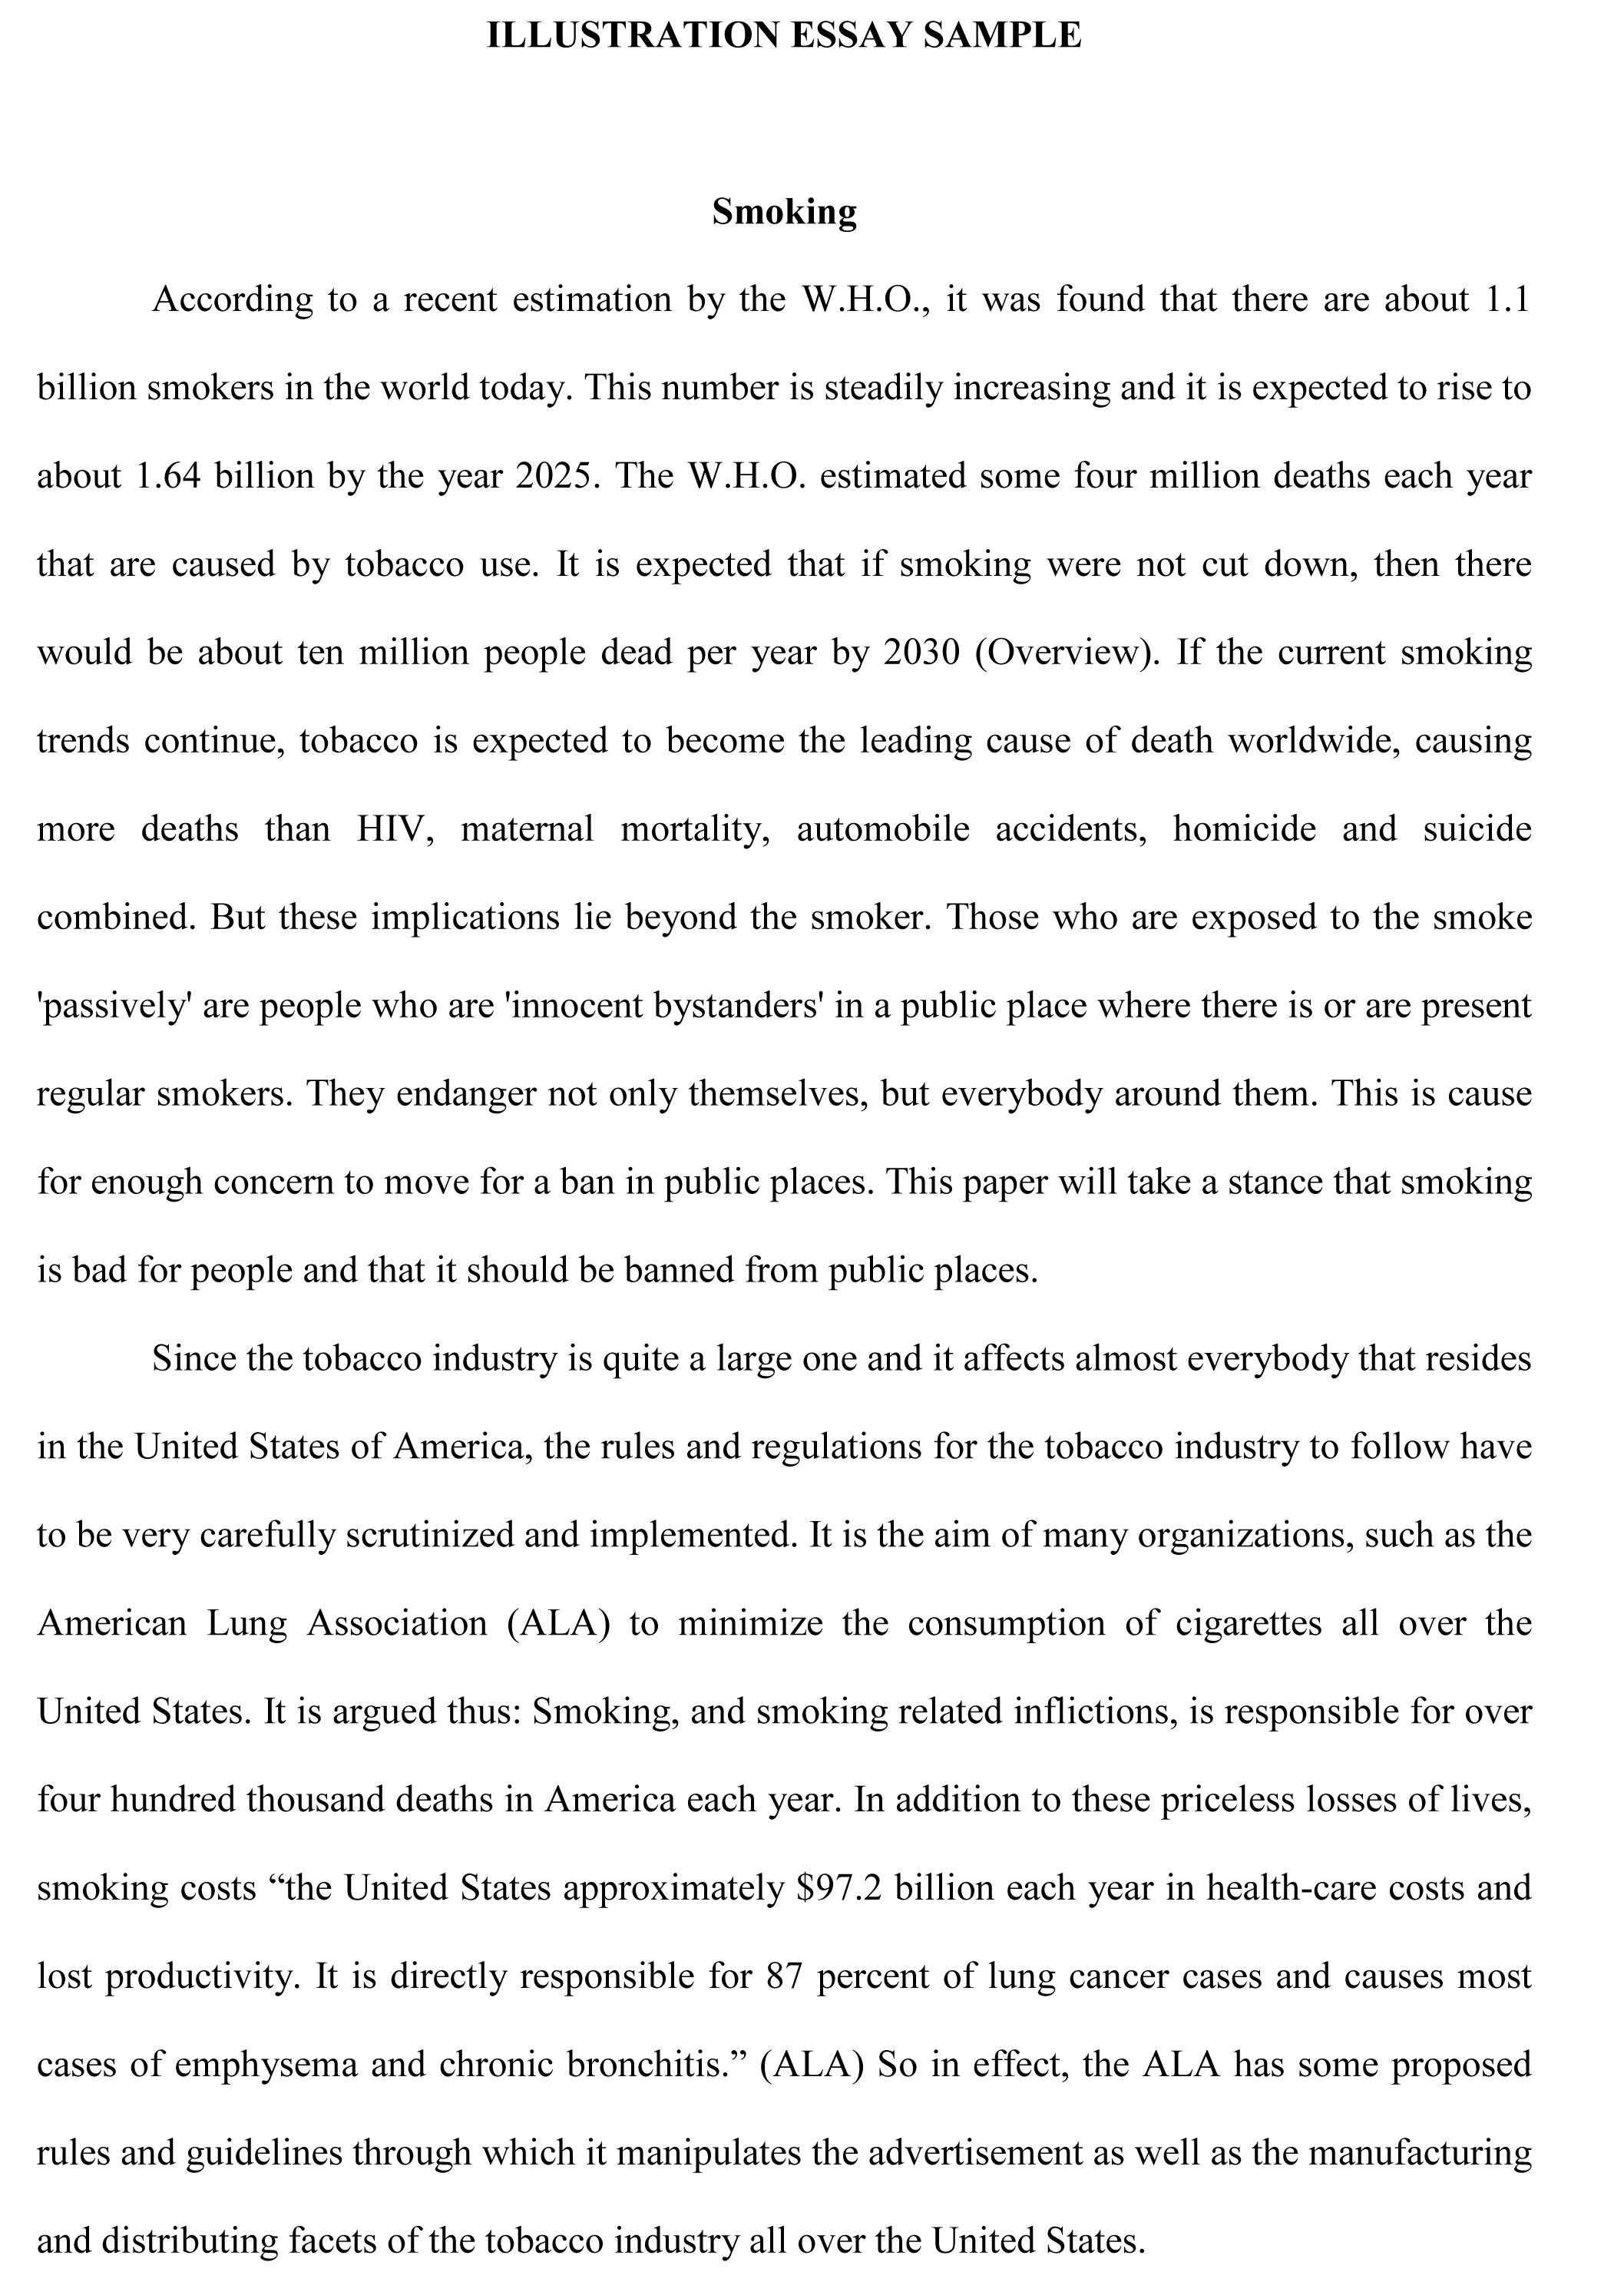 001 Illustration Essay Sample Writing Samples Unbelievable Examples Pdf For Grade 5 Full